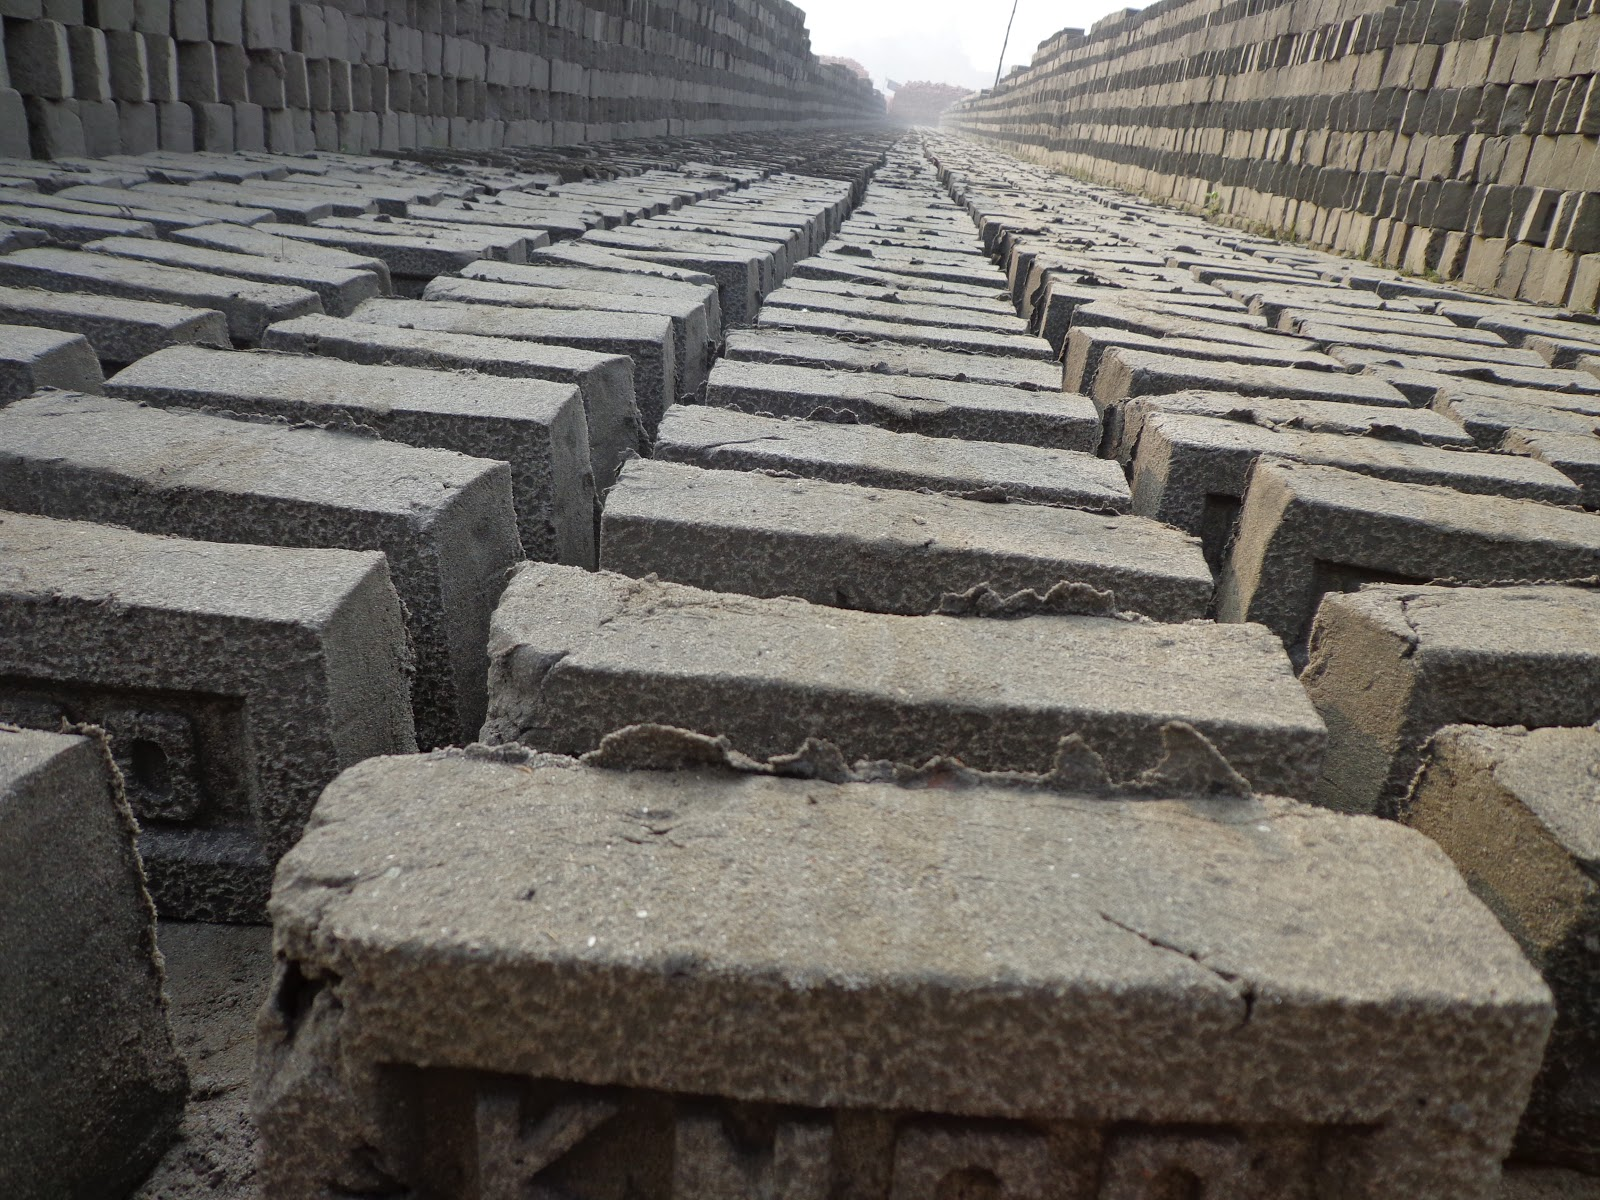 How Do You Make Clay Bricks : What would she say how do you make a brick